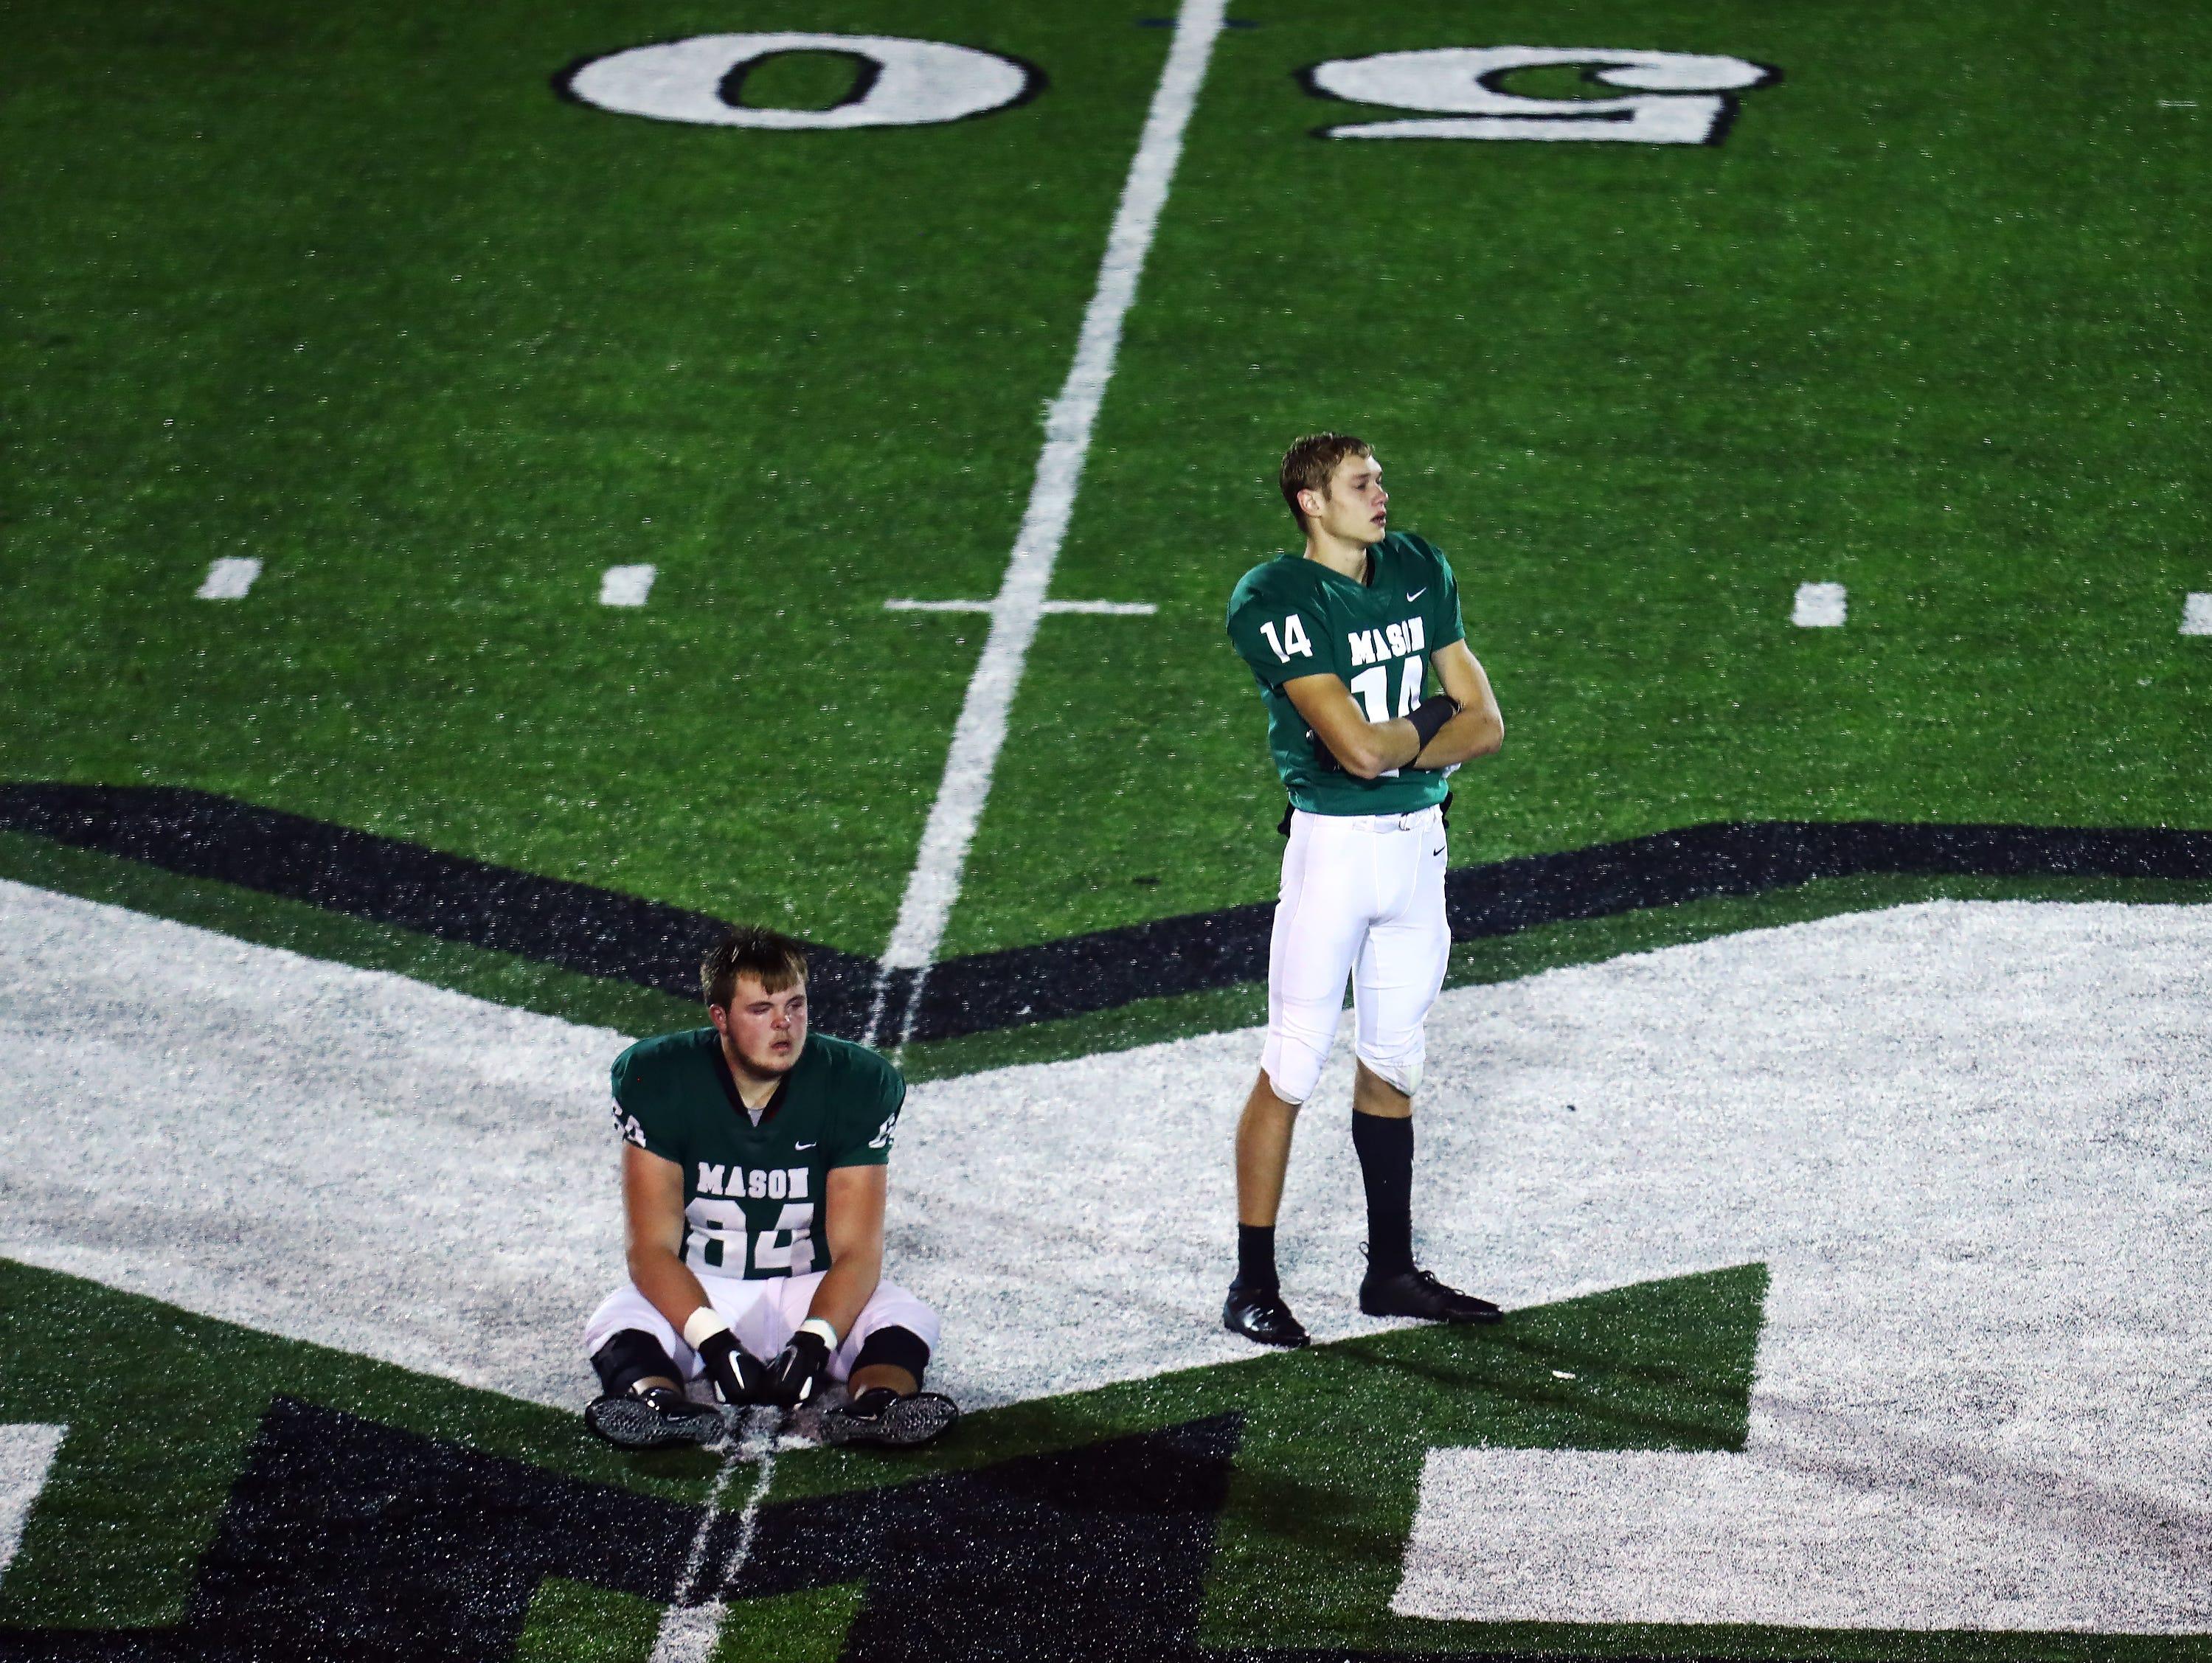 Mason seniors Camden Wood [64] and Jaydon Kauhfold contemplate their last time on the field as Comet football players. Lakota East defeated Mason 20-17.